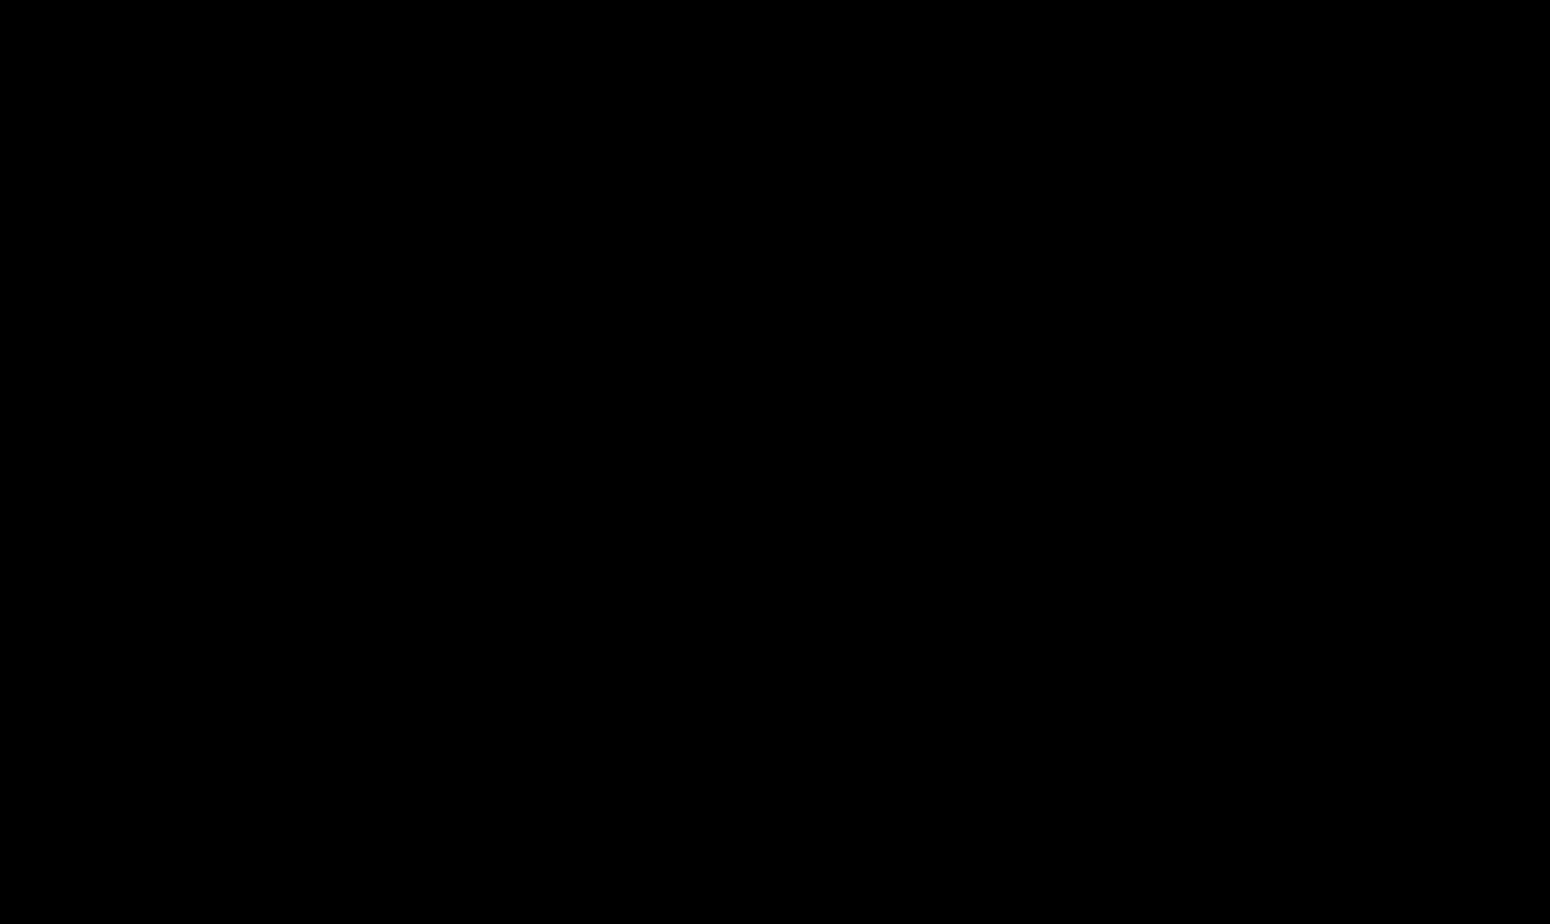 Dansyl 2-(2-aminoethoxy)ethanol